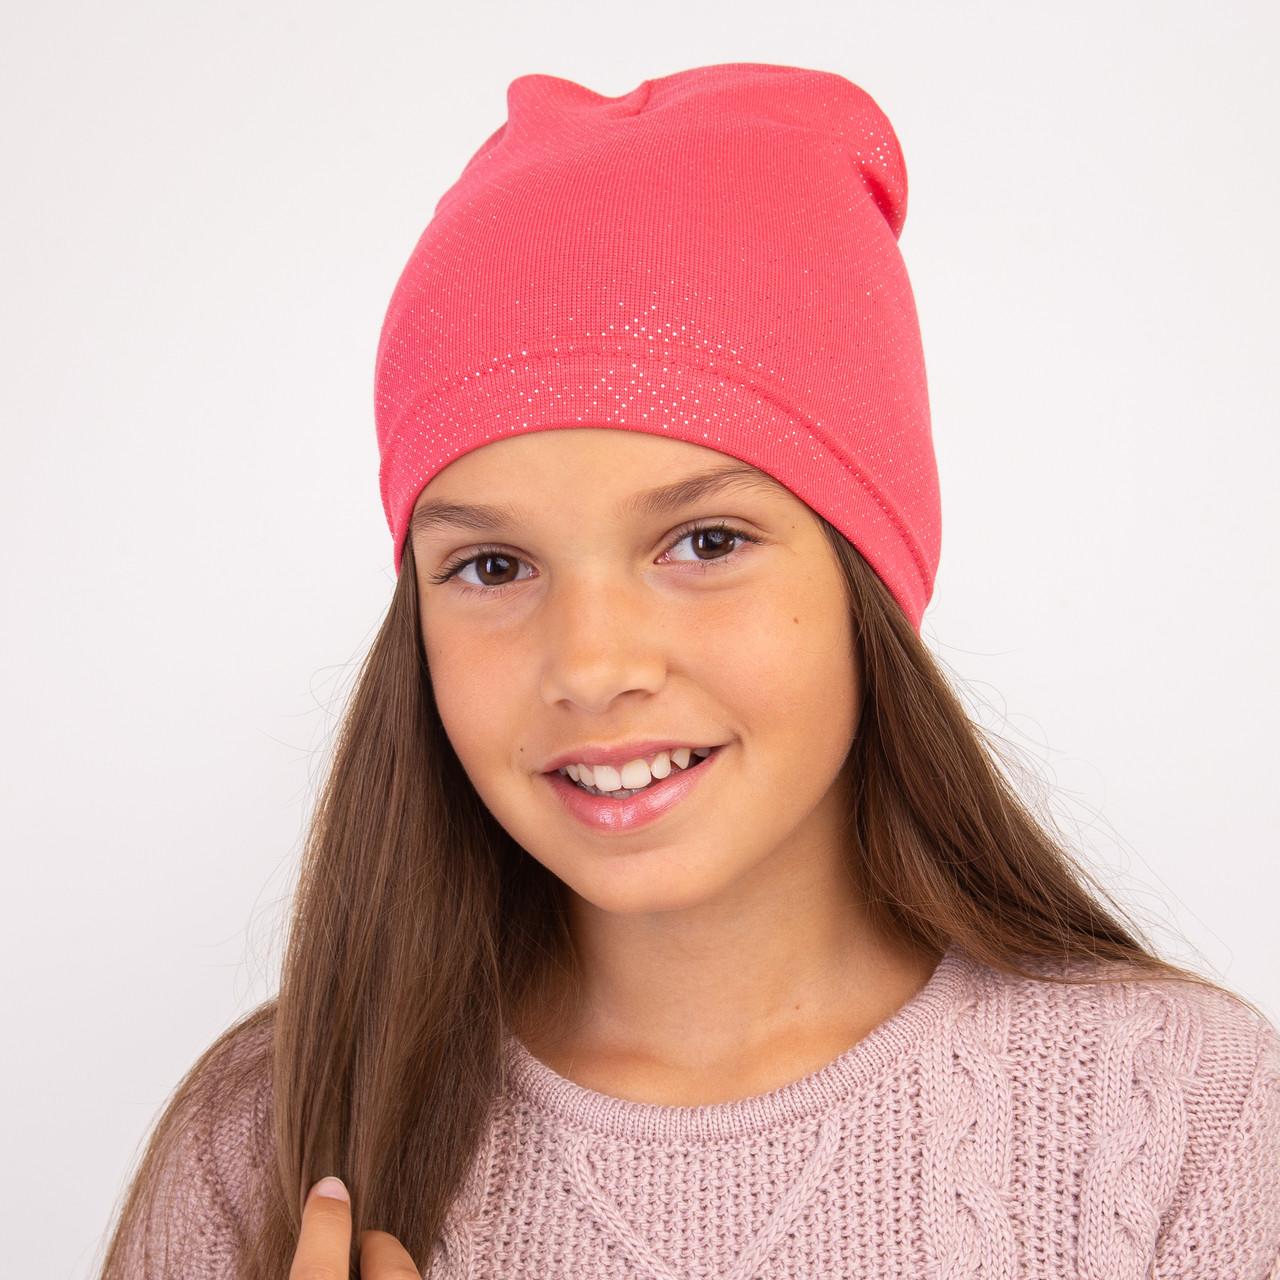 Модная весенняя шапка для девочки оптом - Артикул 2285